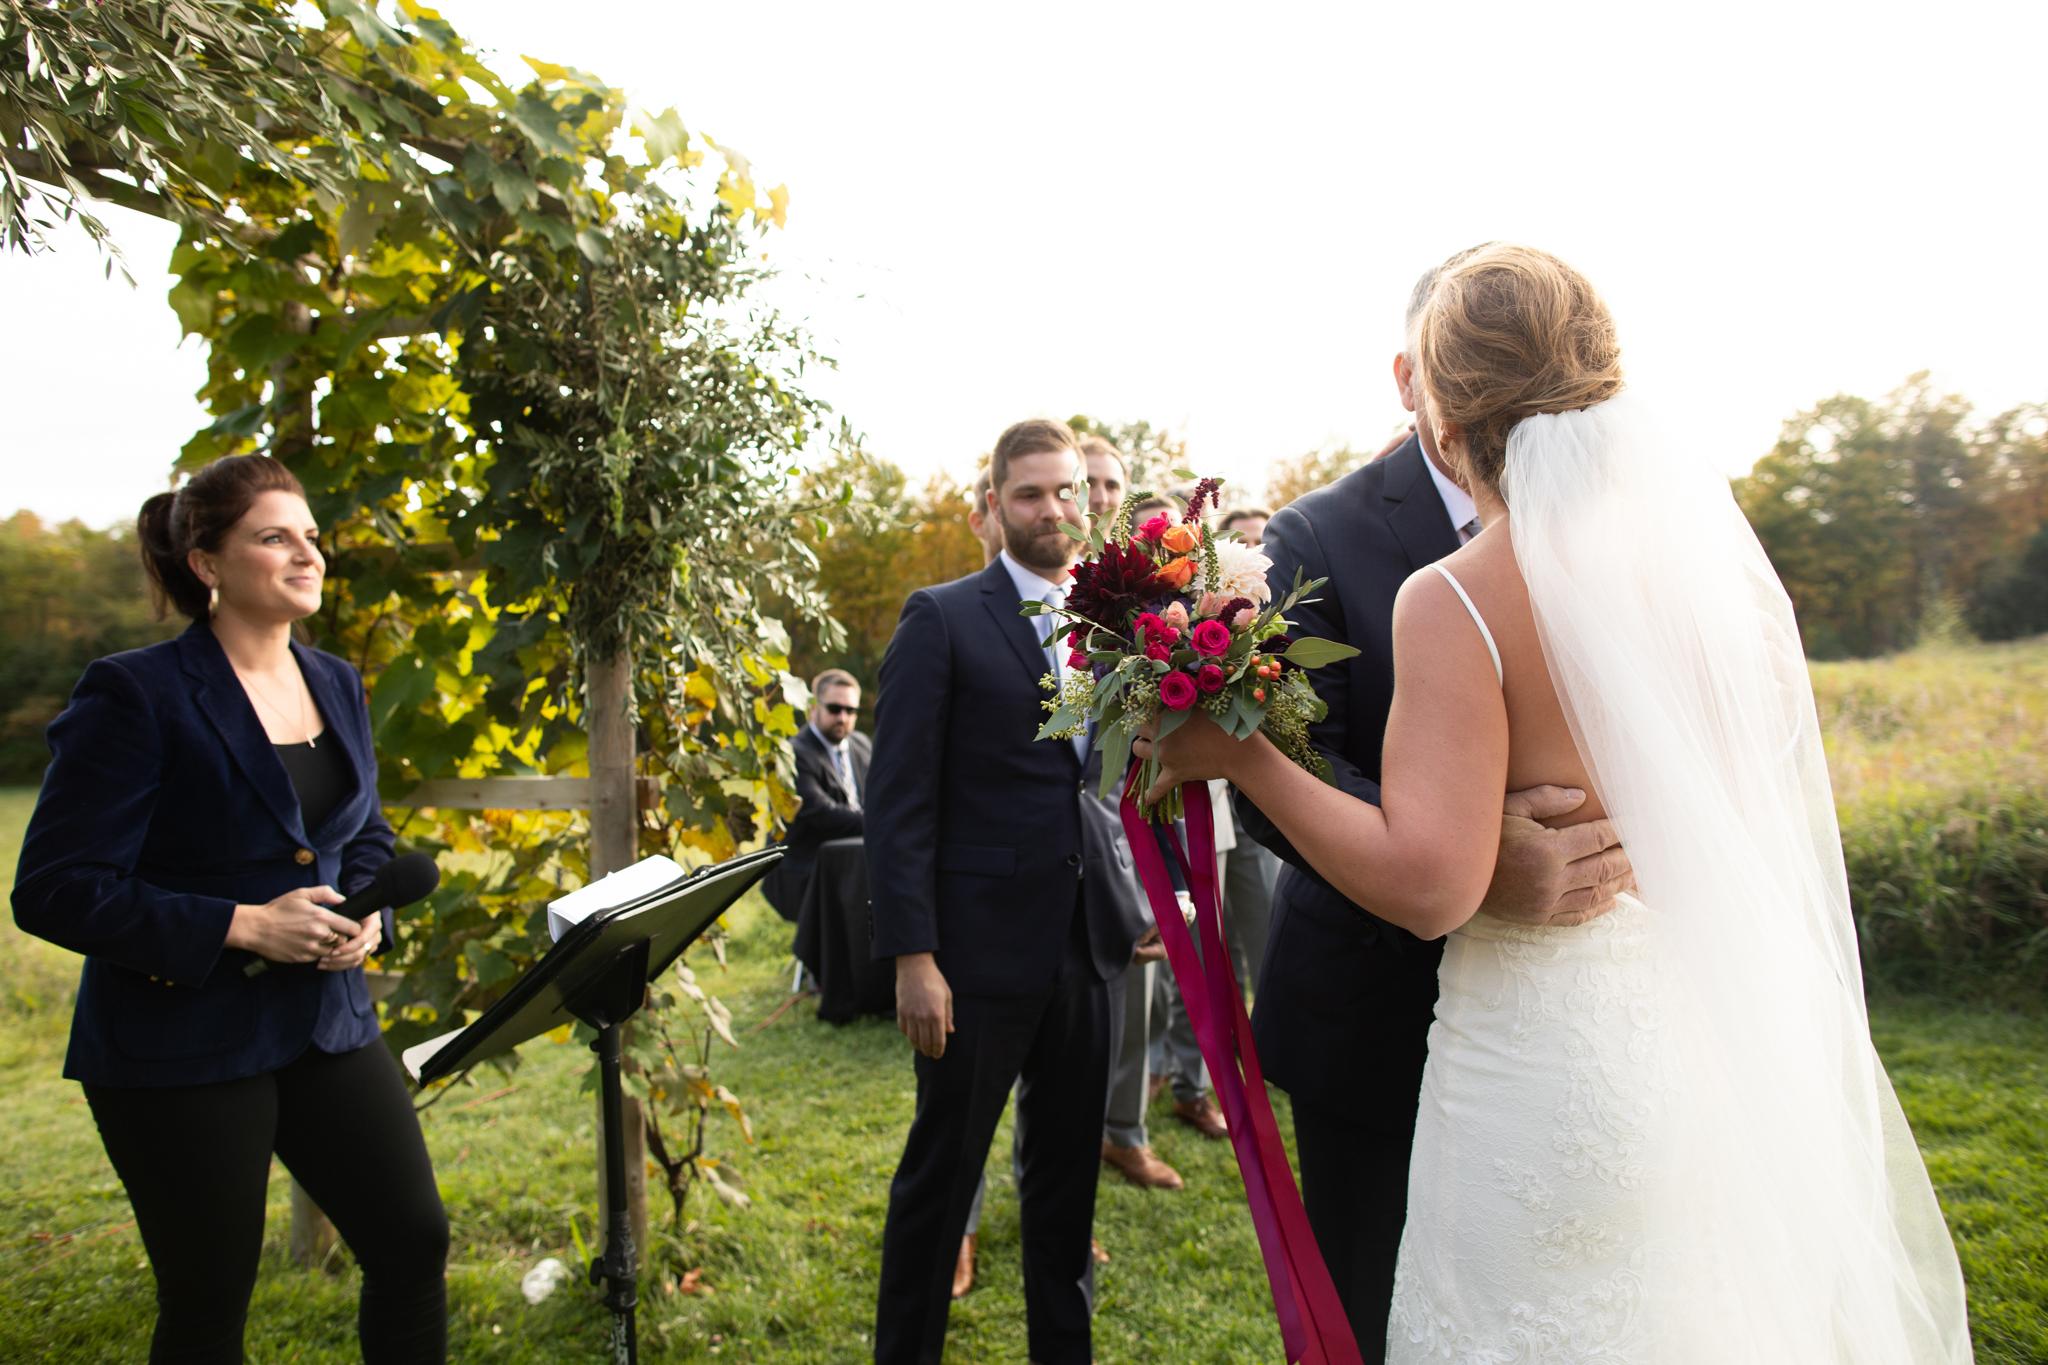 maine-farm-wedding-photographer-stepheneycollins-112.jpg